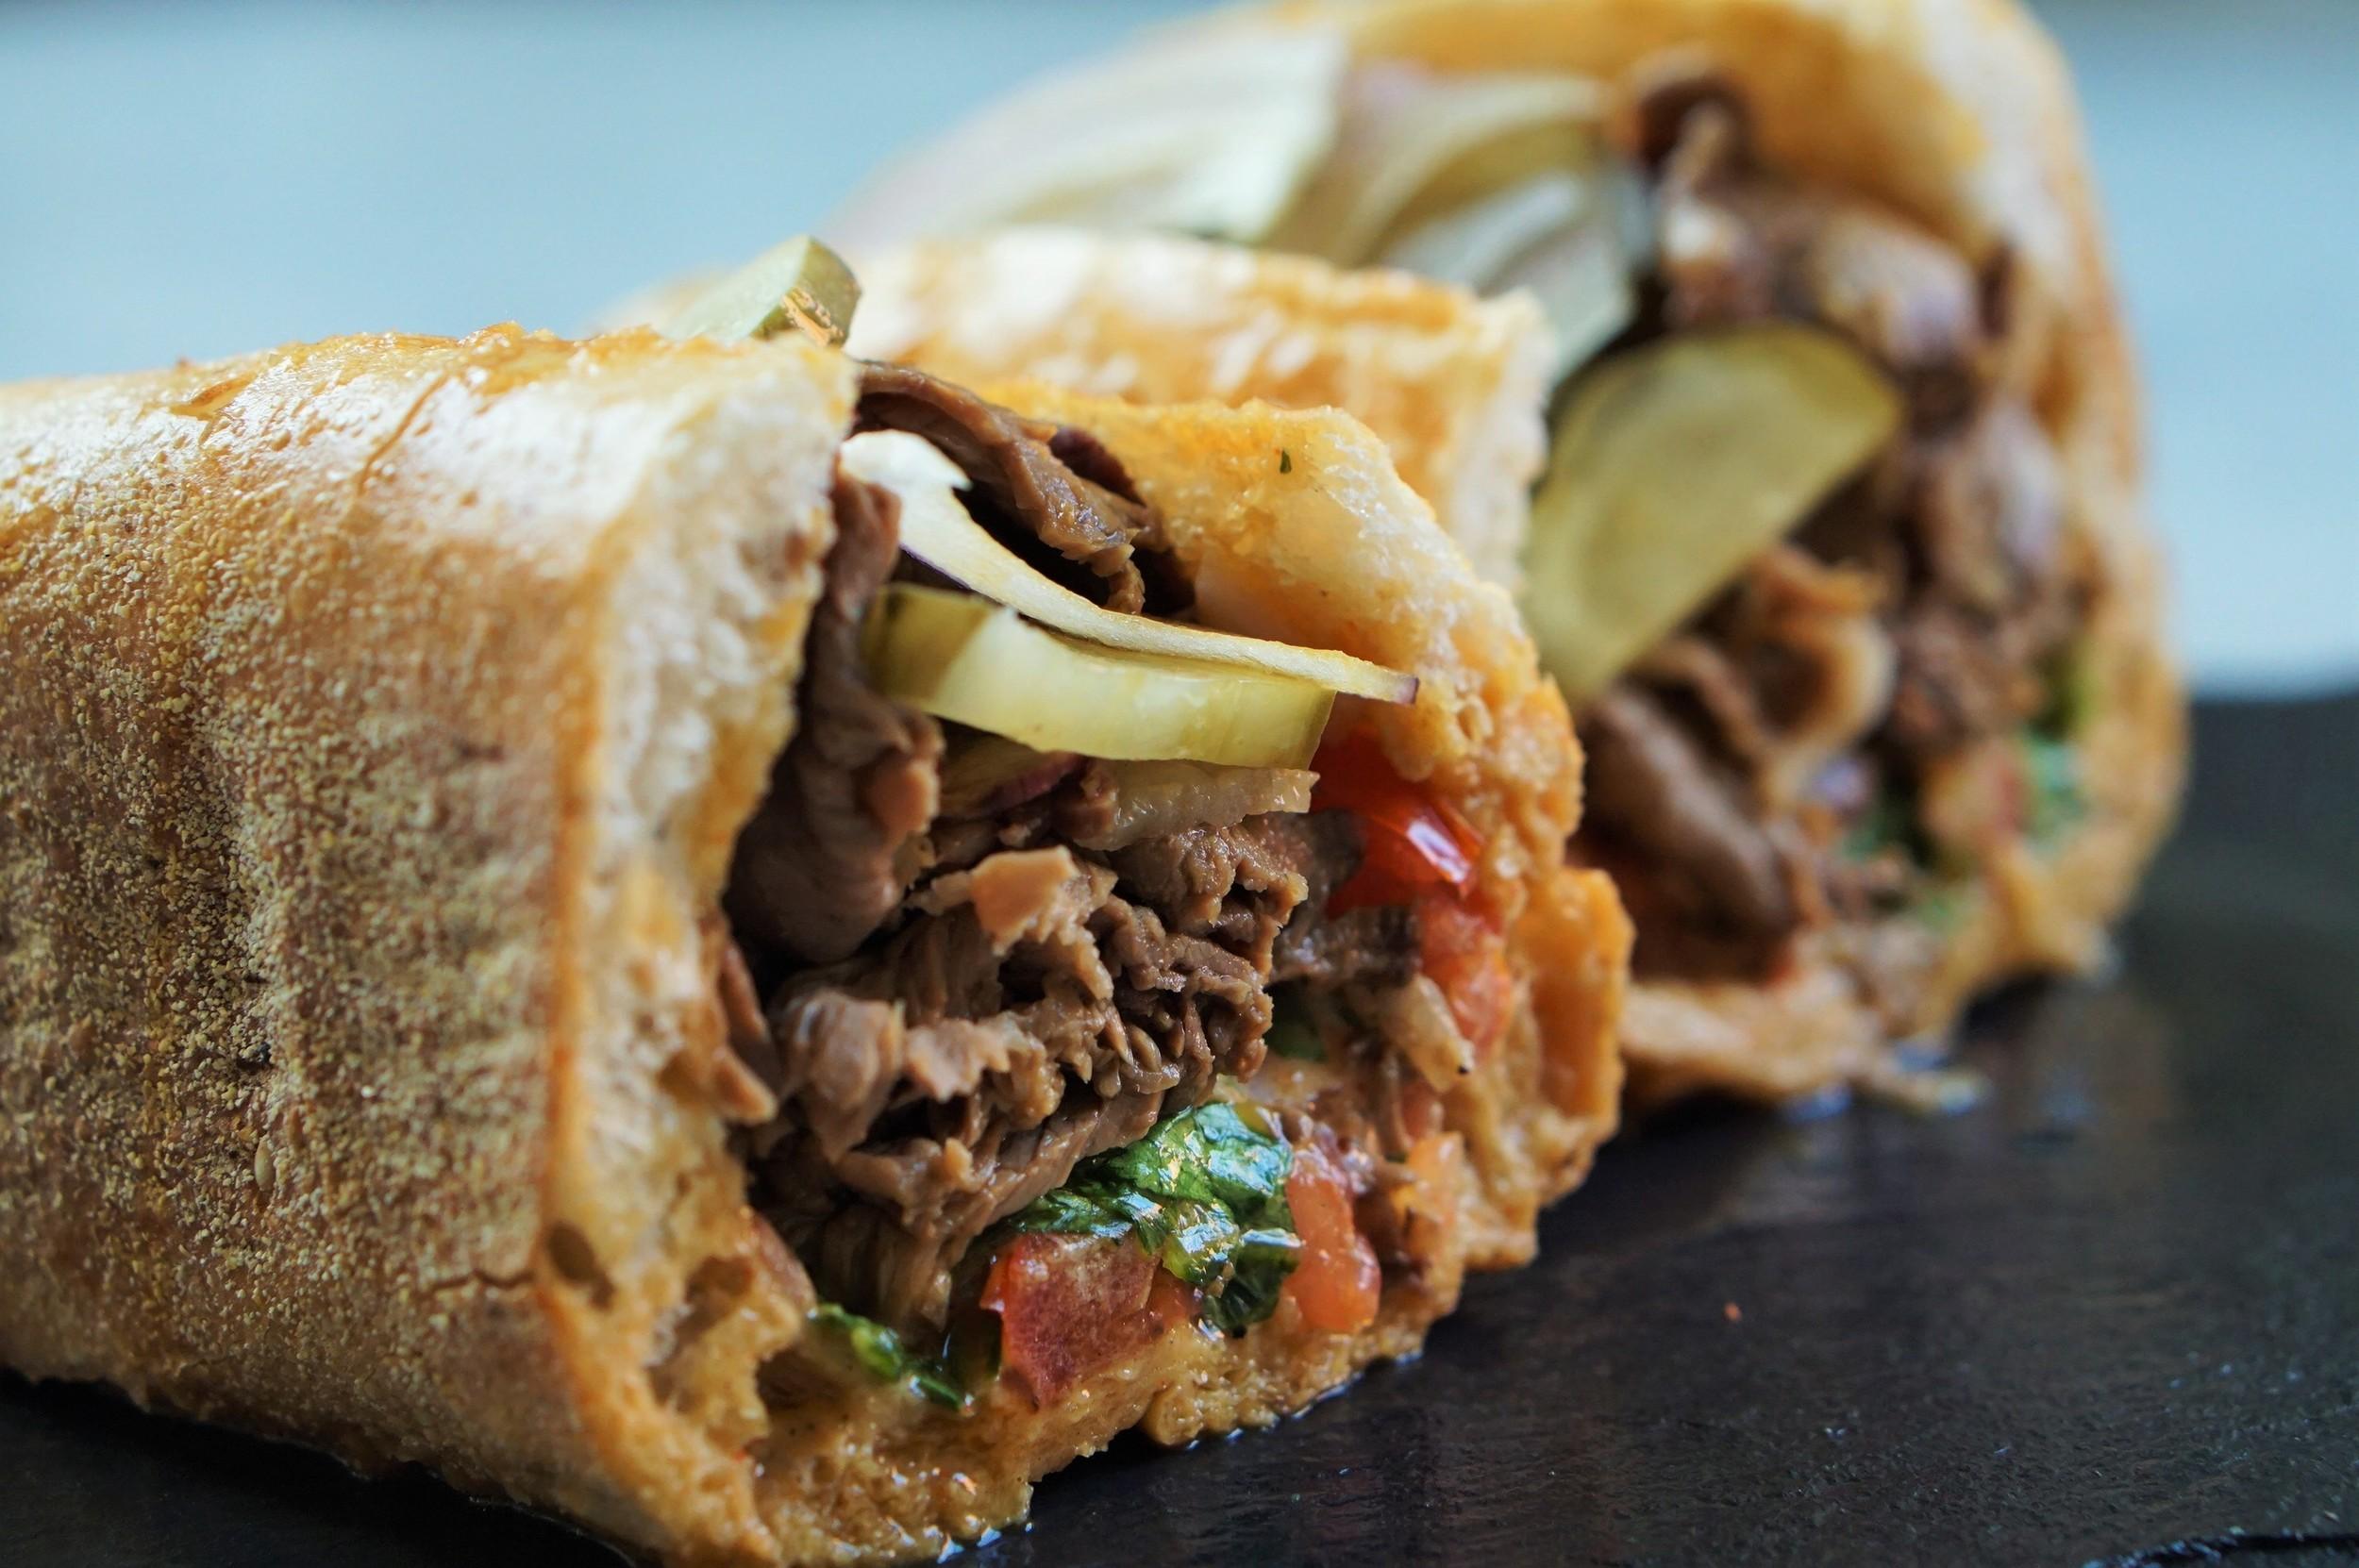 33rd street hospitality, food trucks, philadelphia, summer, new menu, say cheese philly, street food philly, taco mondo, revolution taco